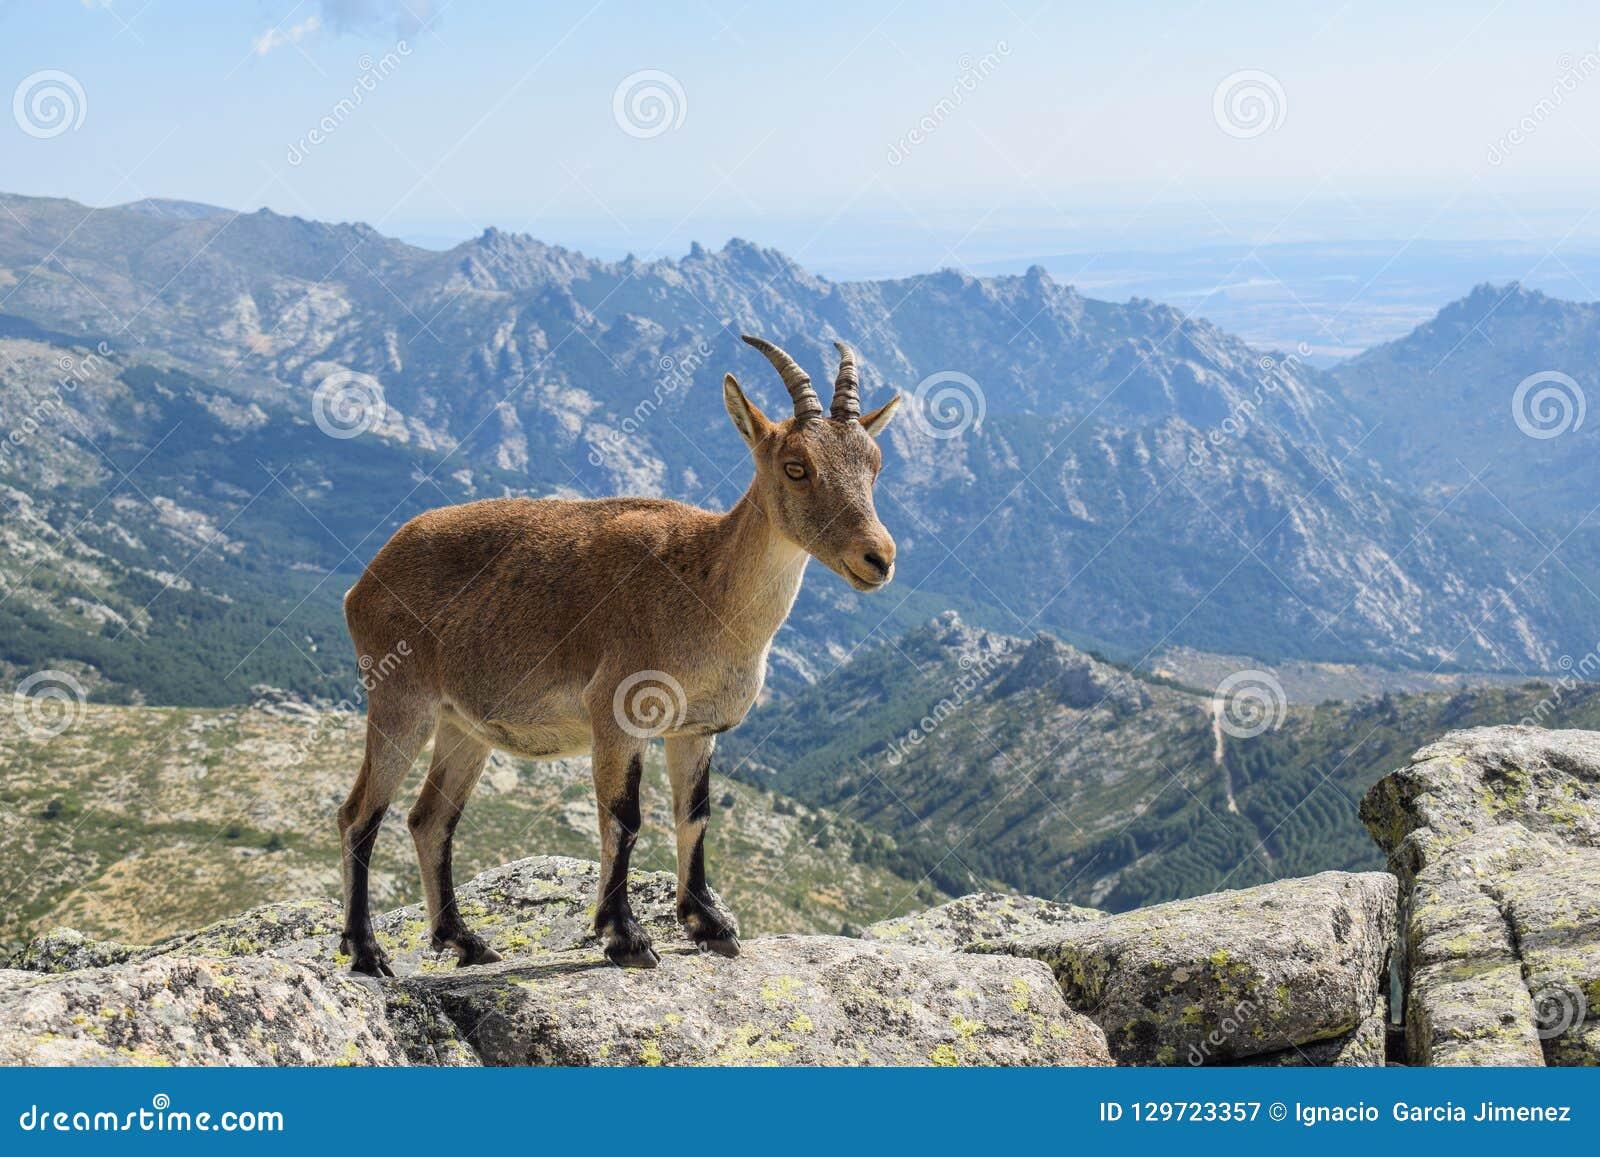 Goat nature 19